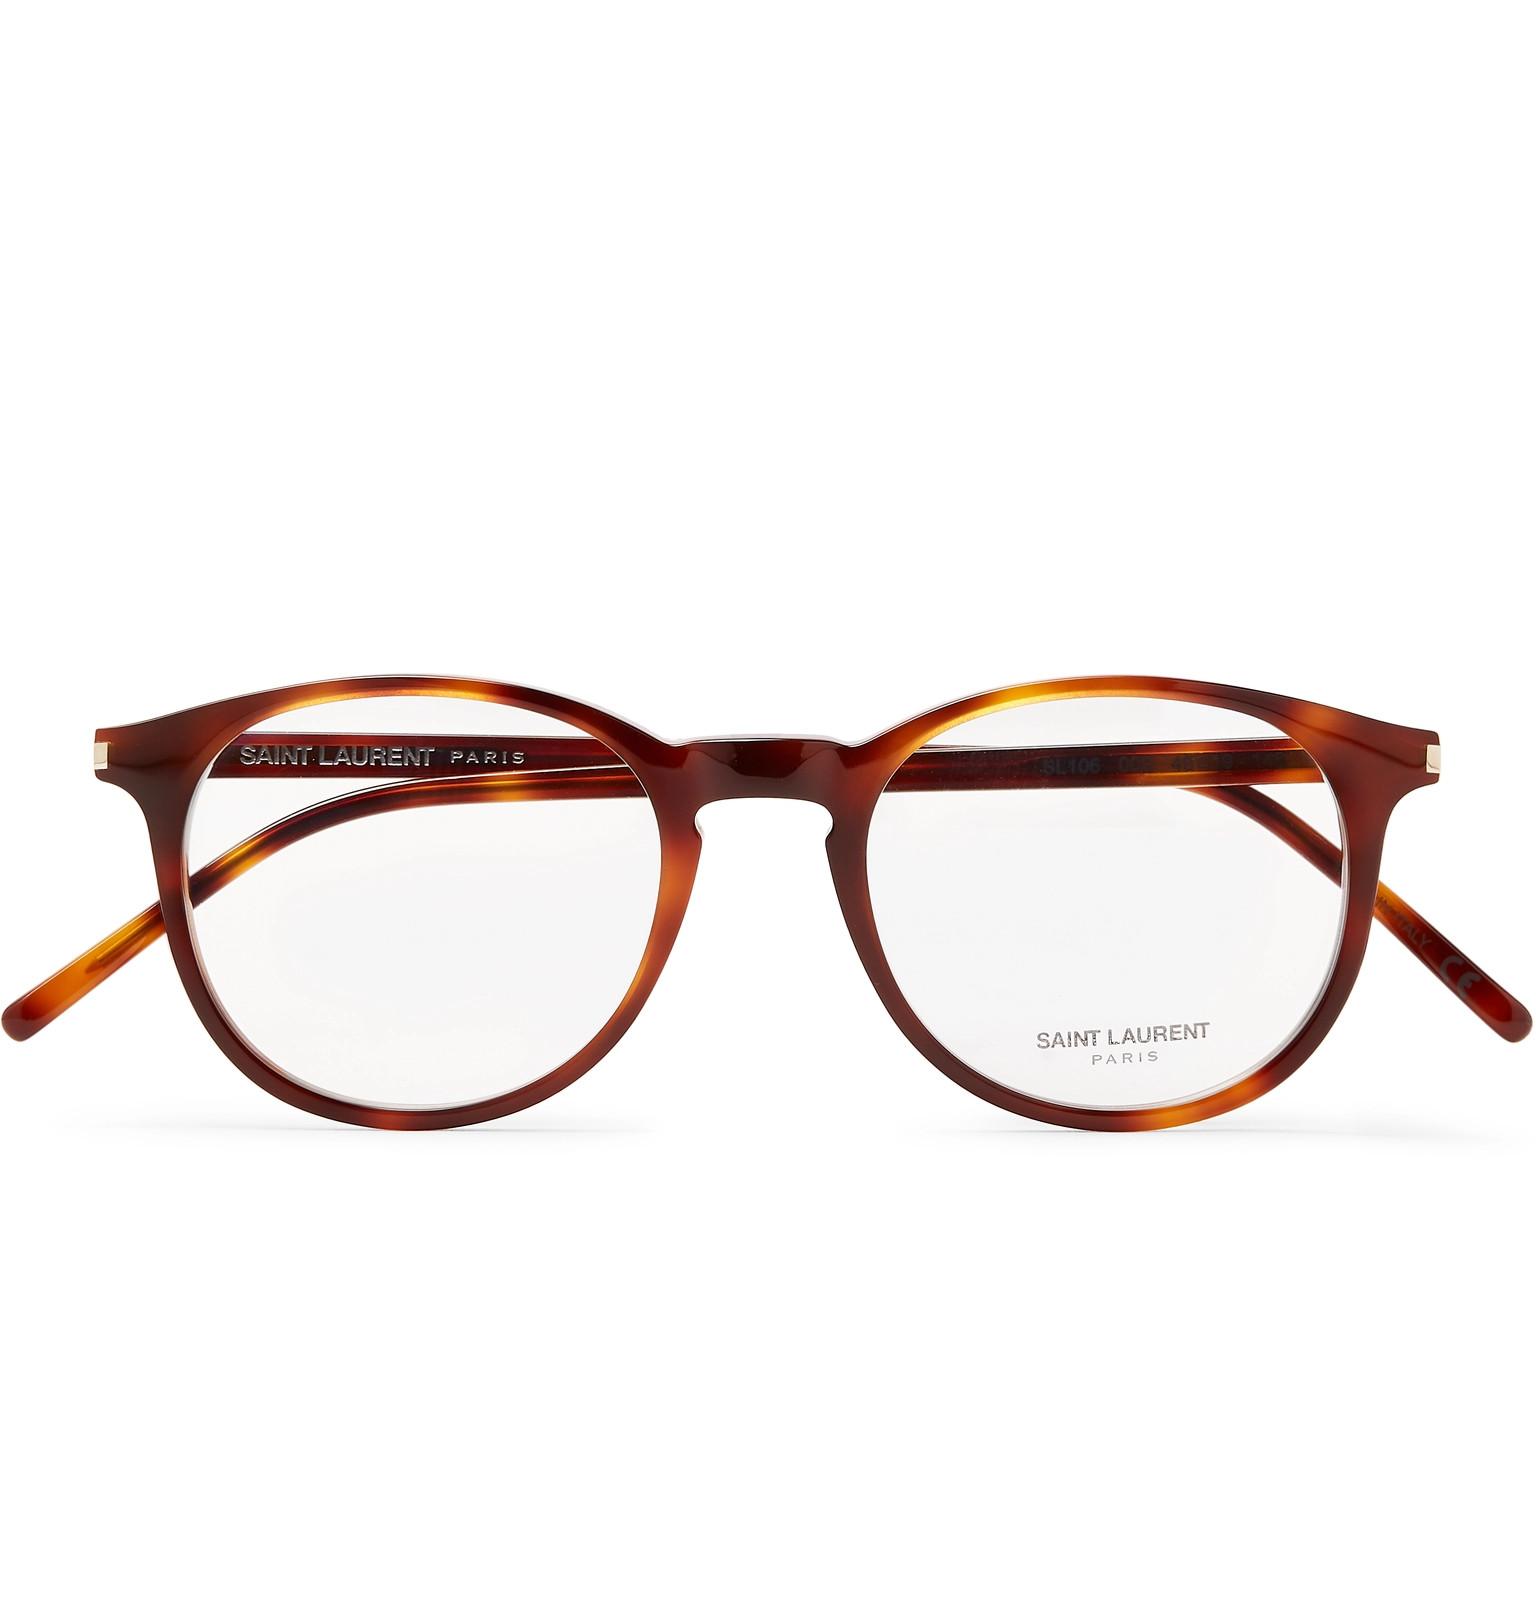 dfba5ba8c5a Saint Laurent - Round-Frame Tortoiseshell Acetate Optical Glasses